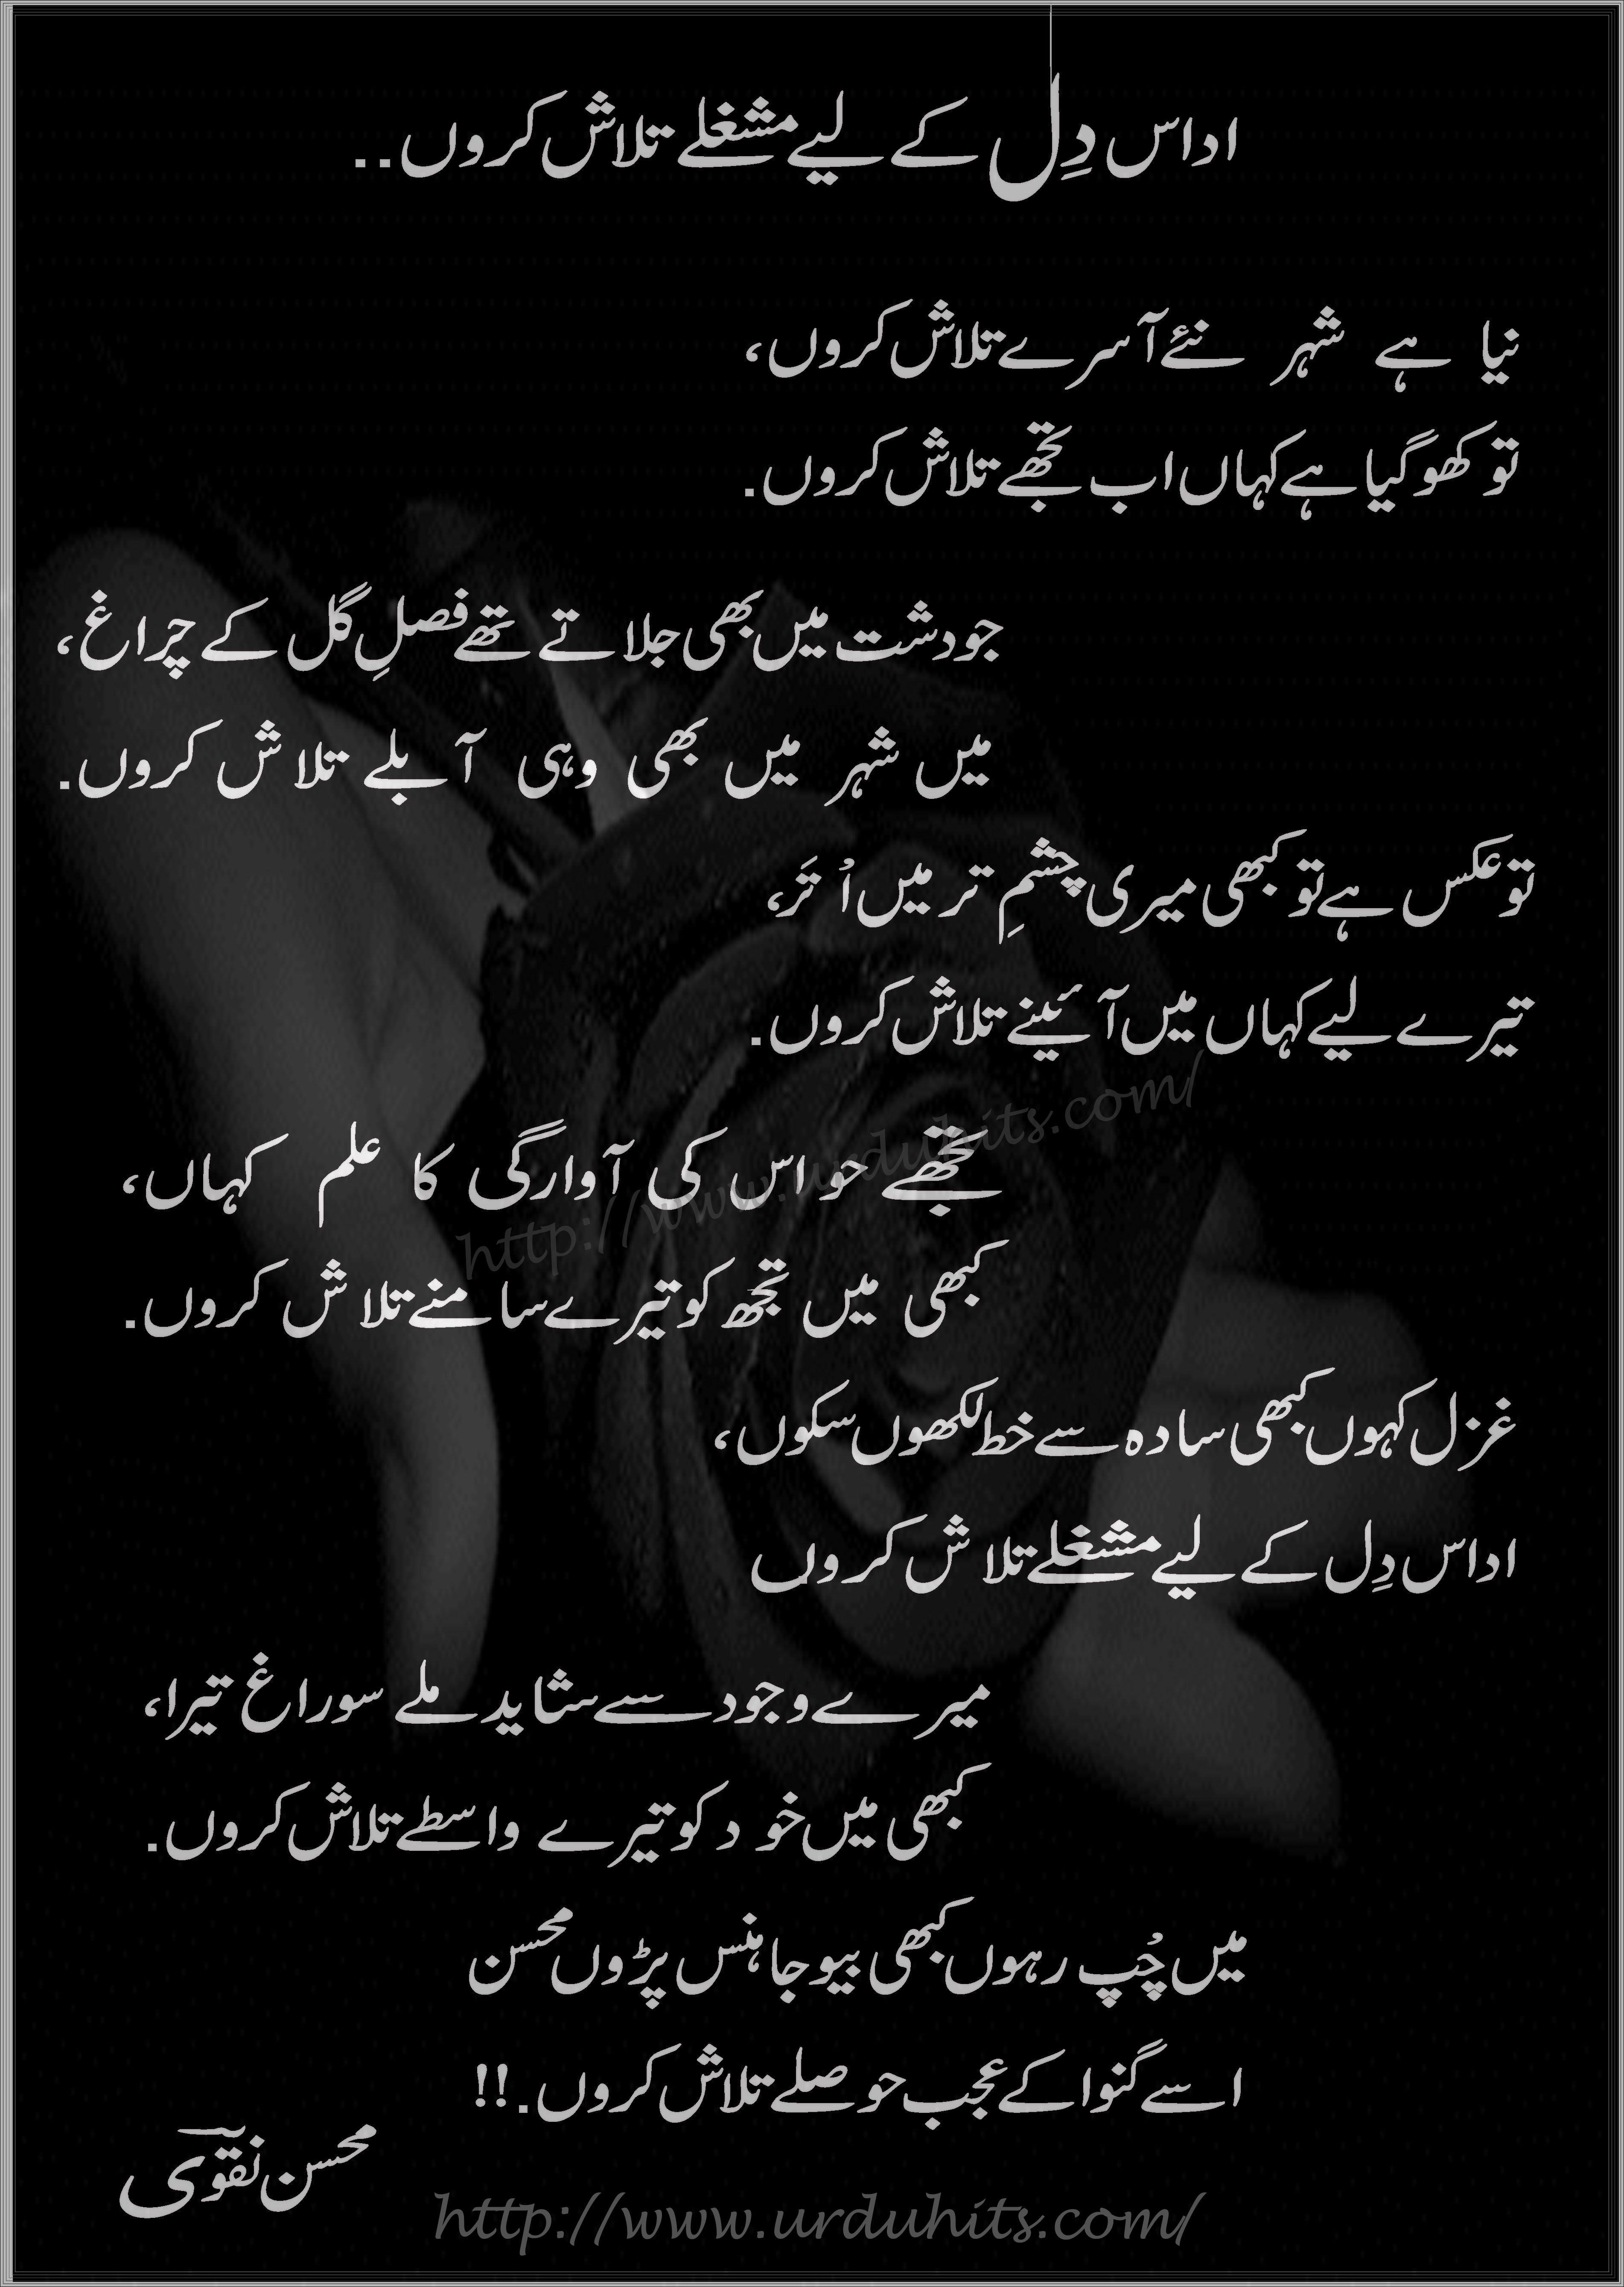 mohsin naqvi poetry - Google Search